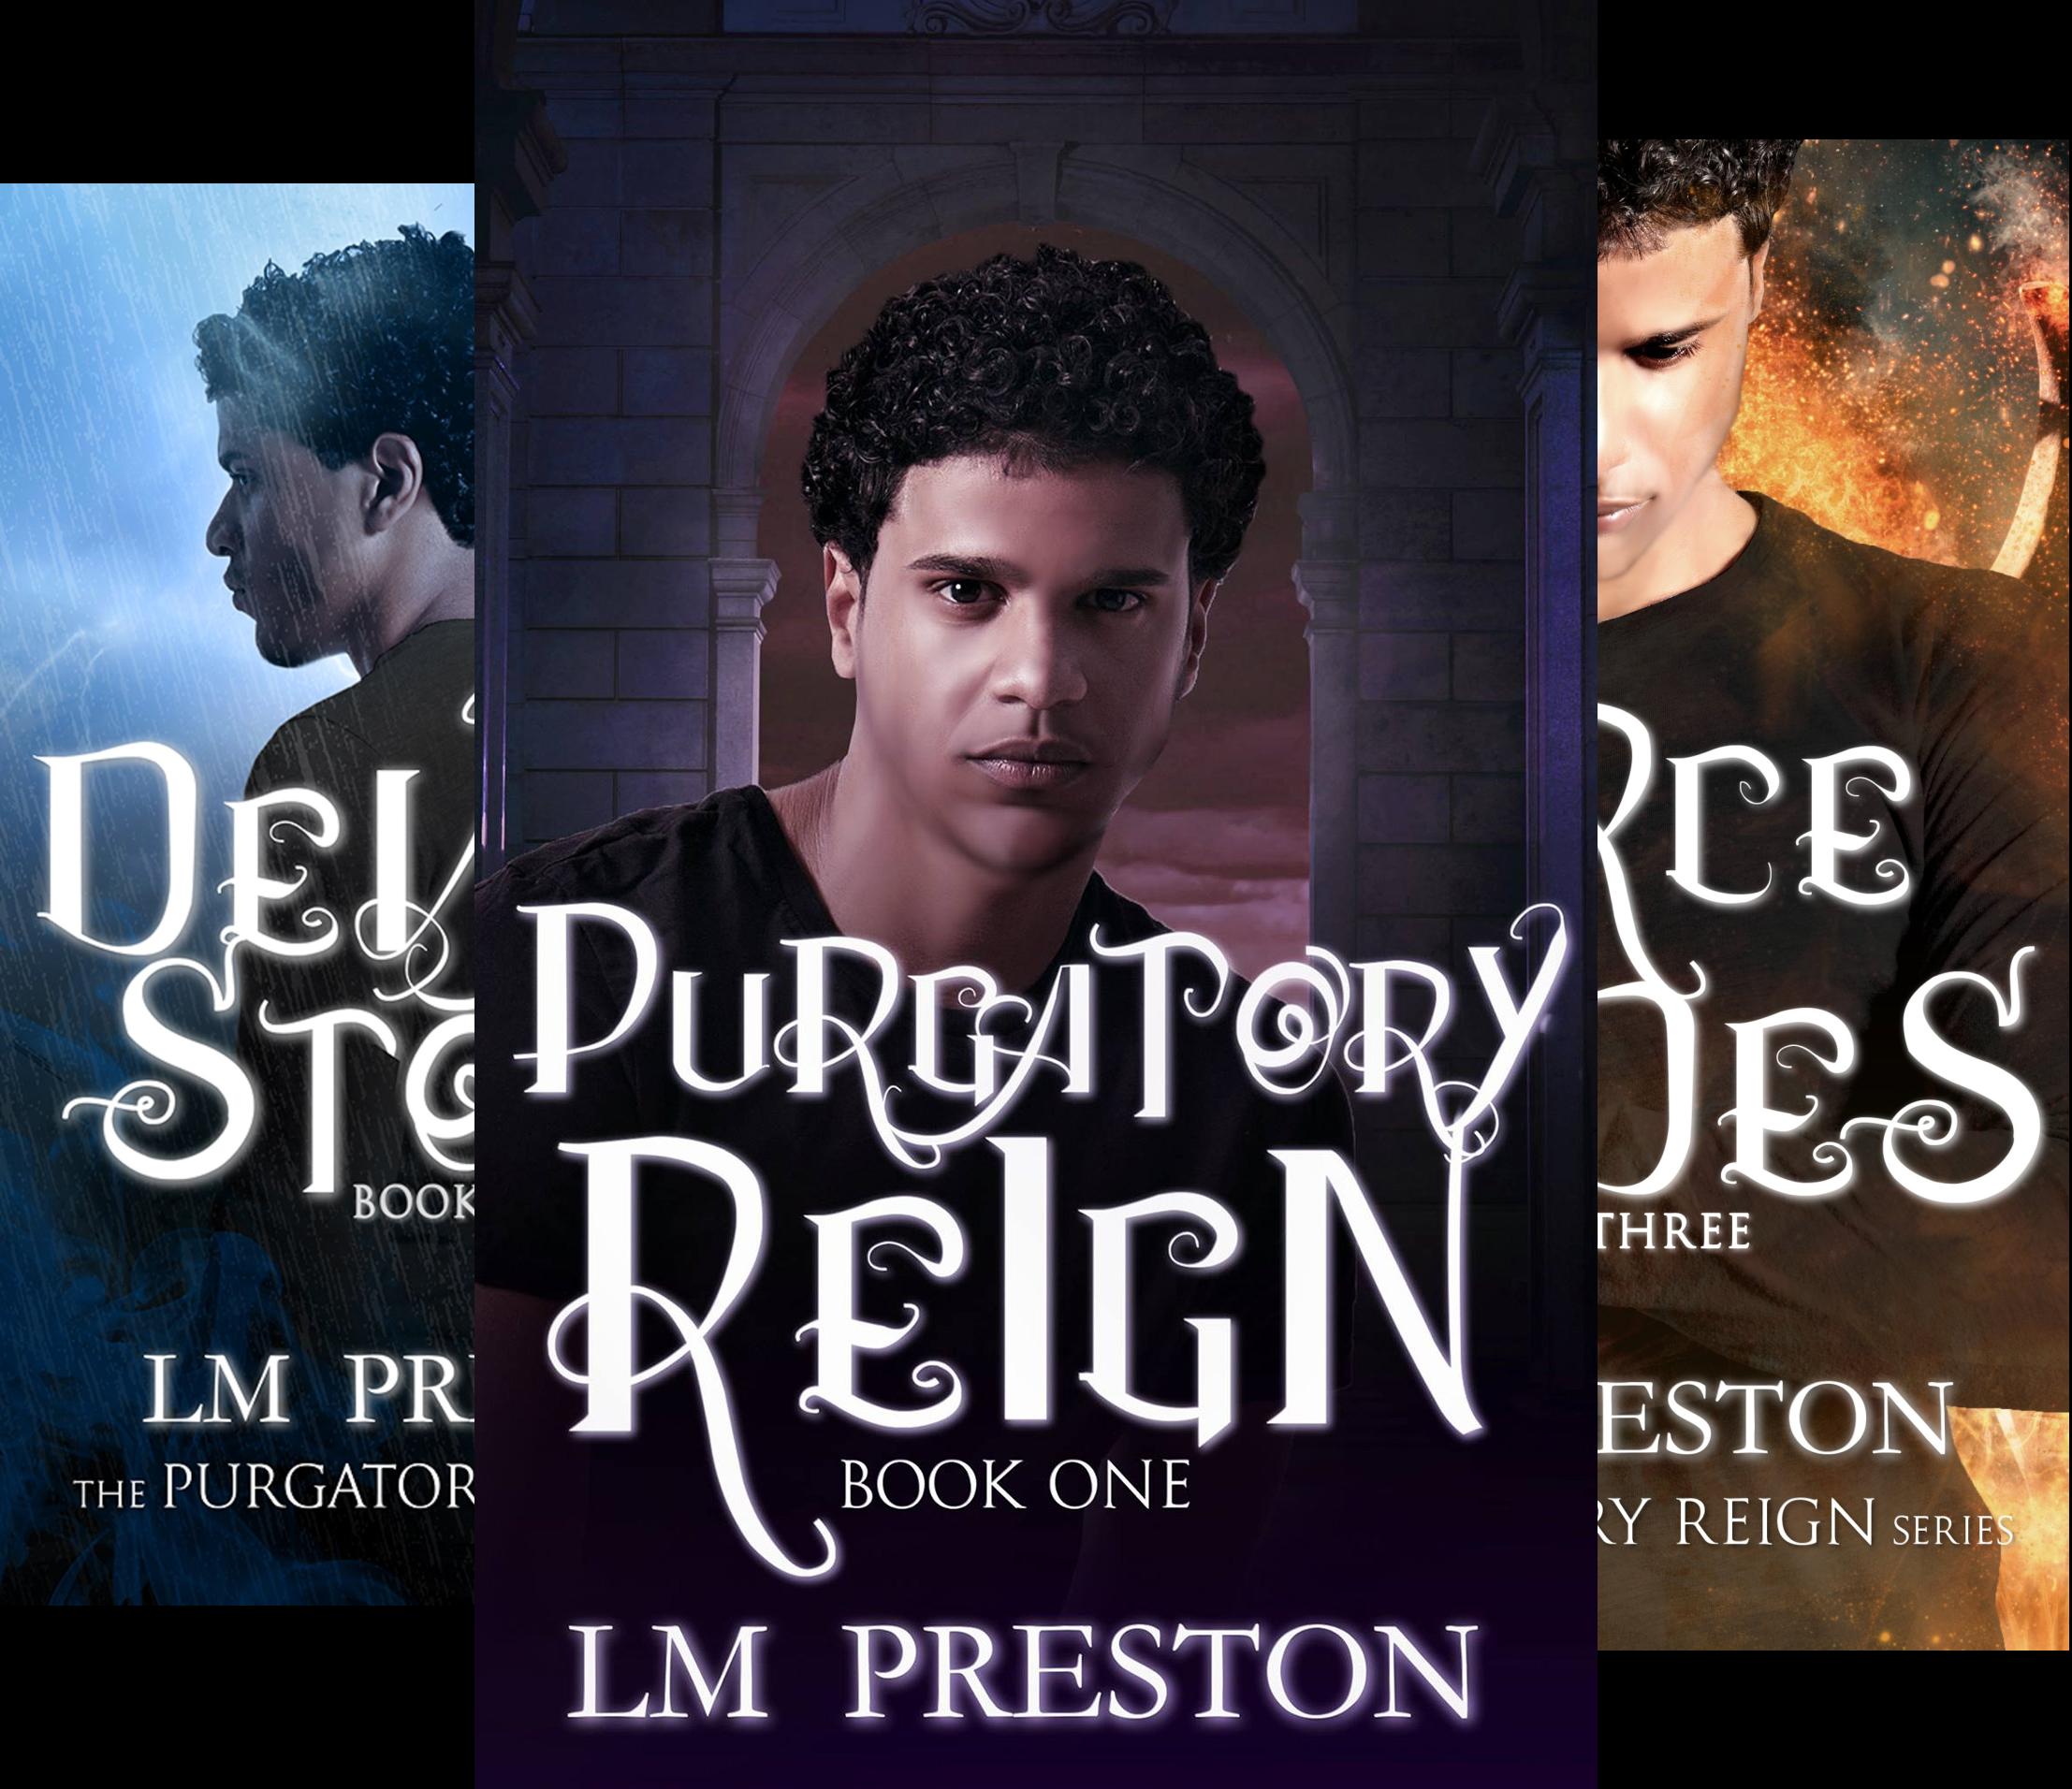 Purgatory Reign Series (3 Book Series)